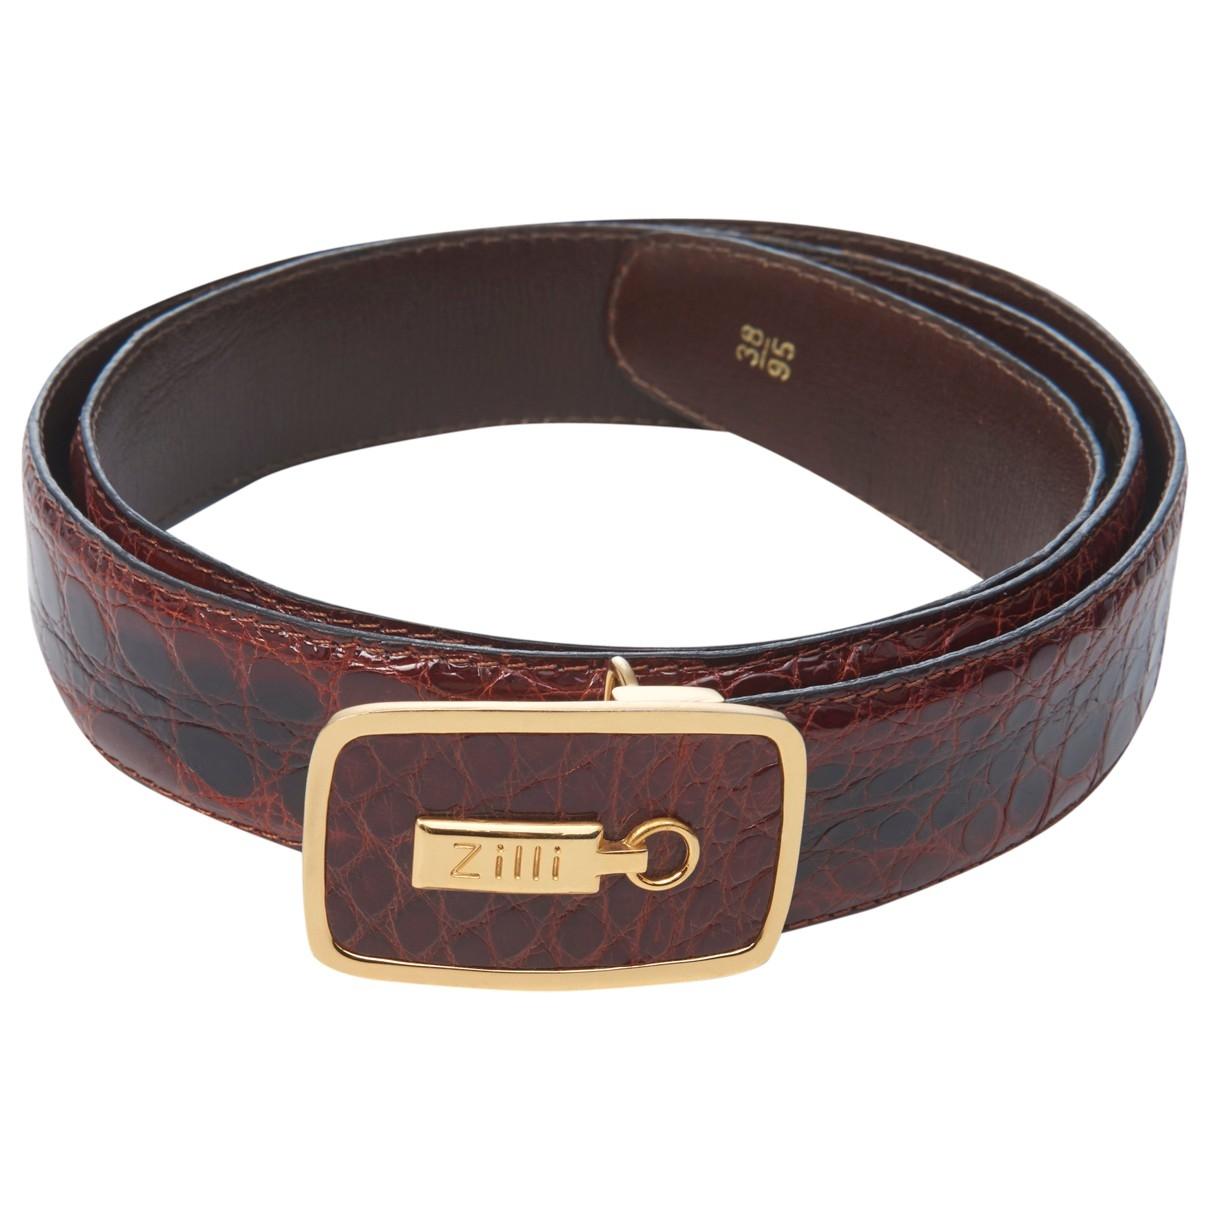 Cinturon de Cocodrilo Zilli